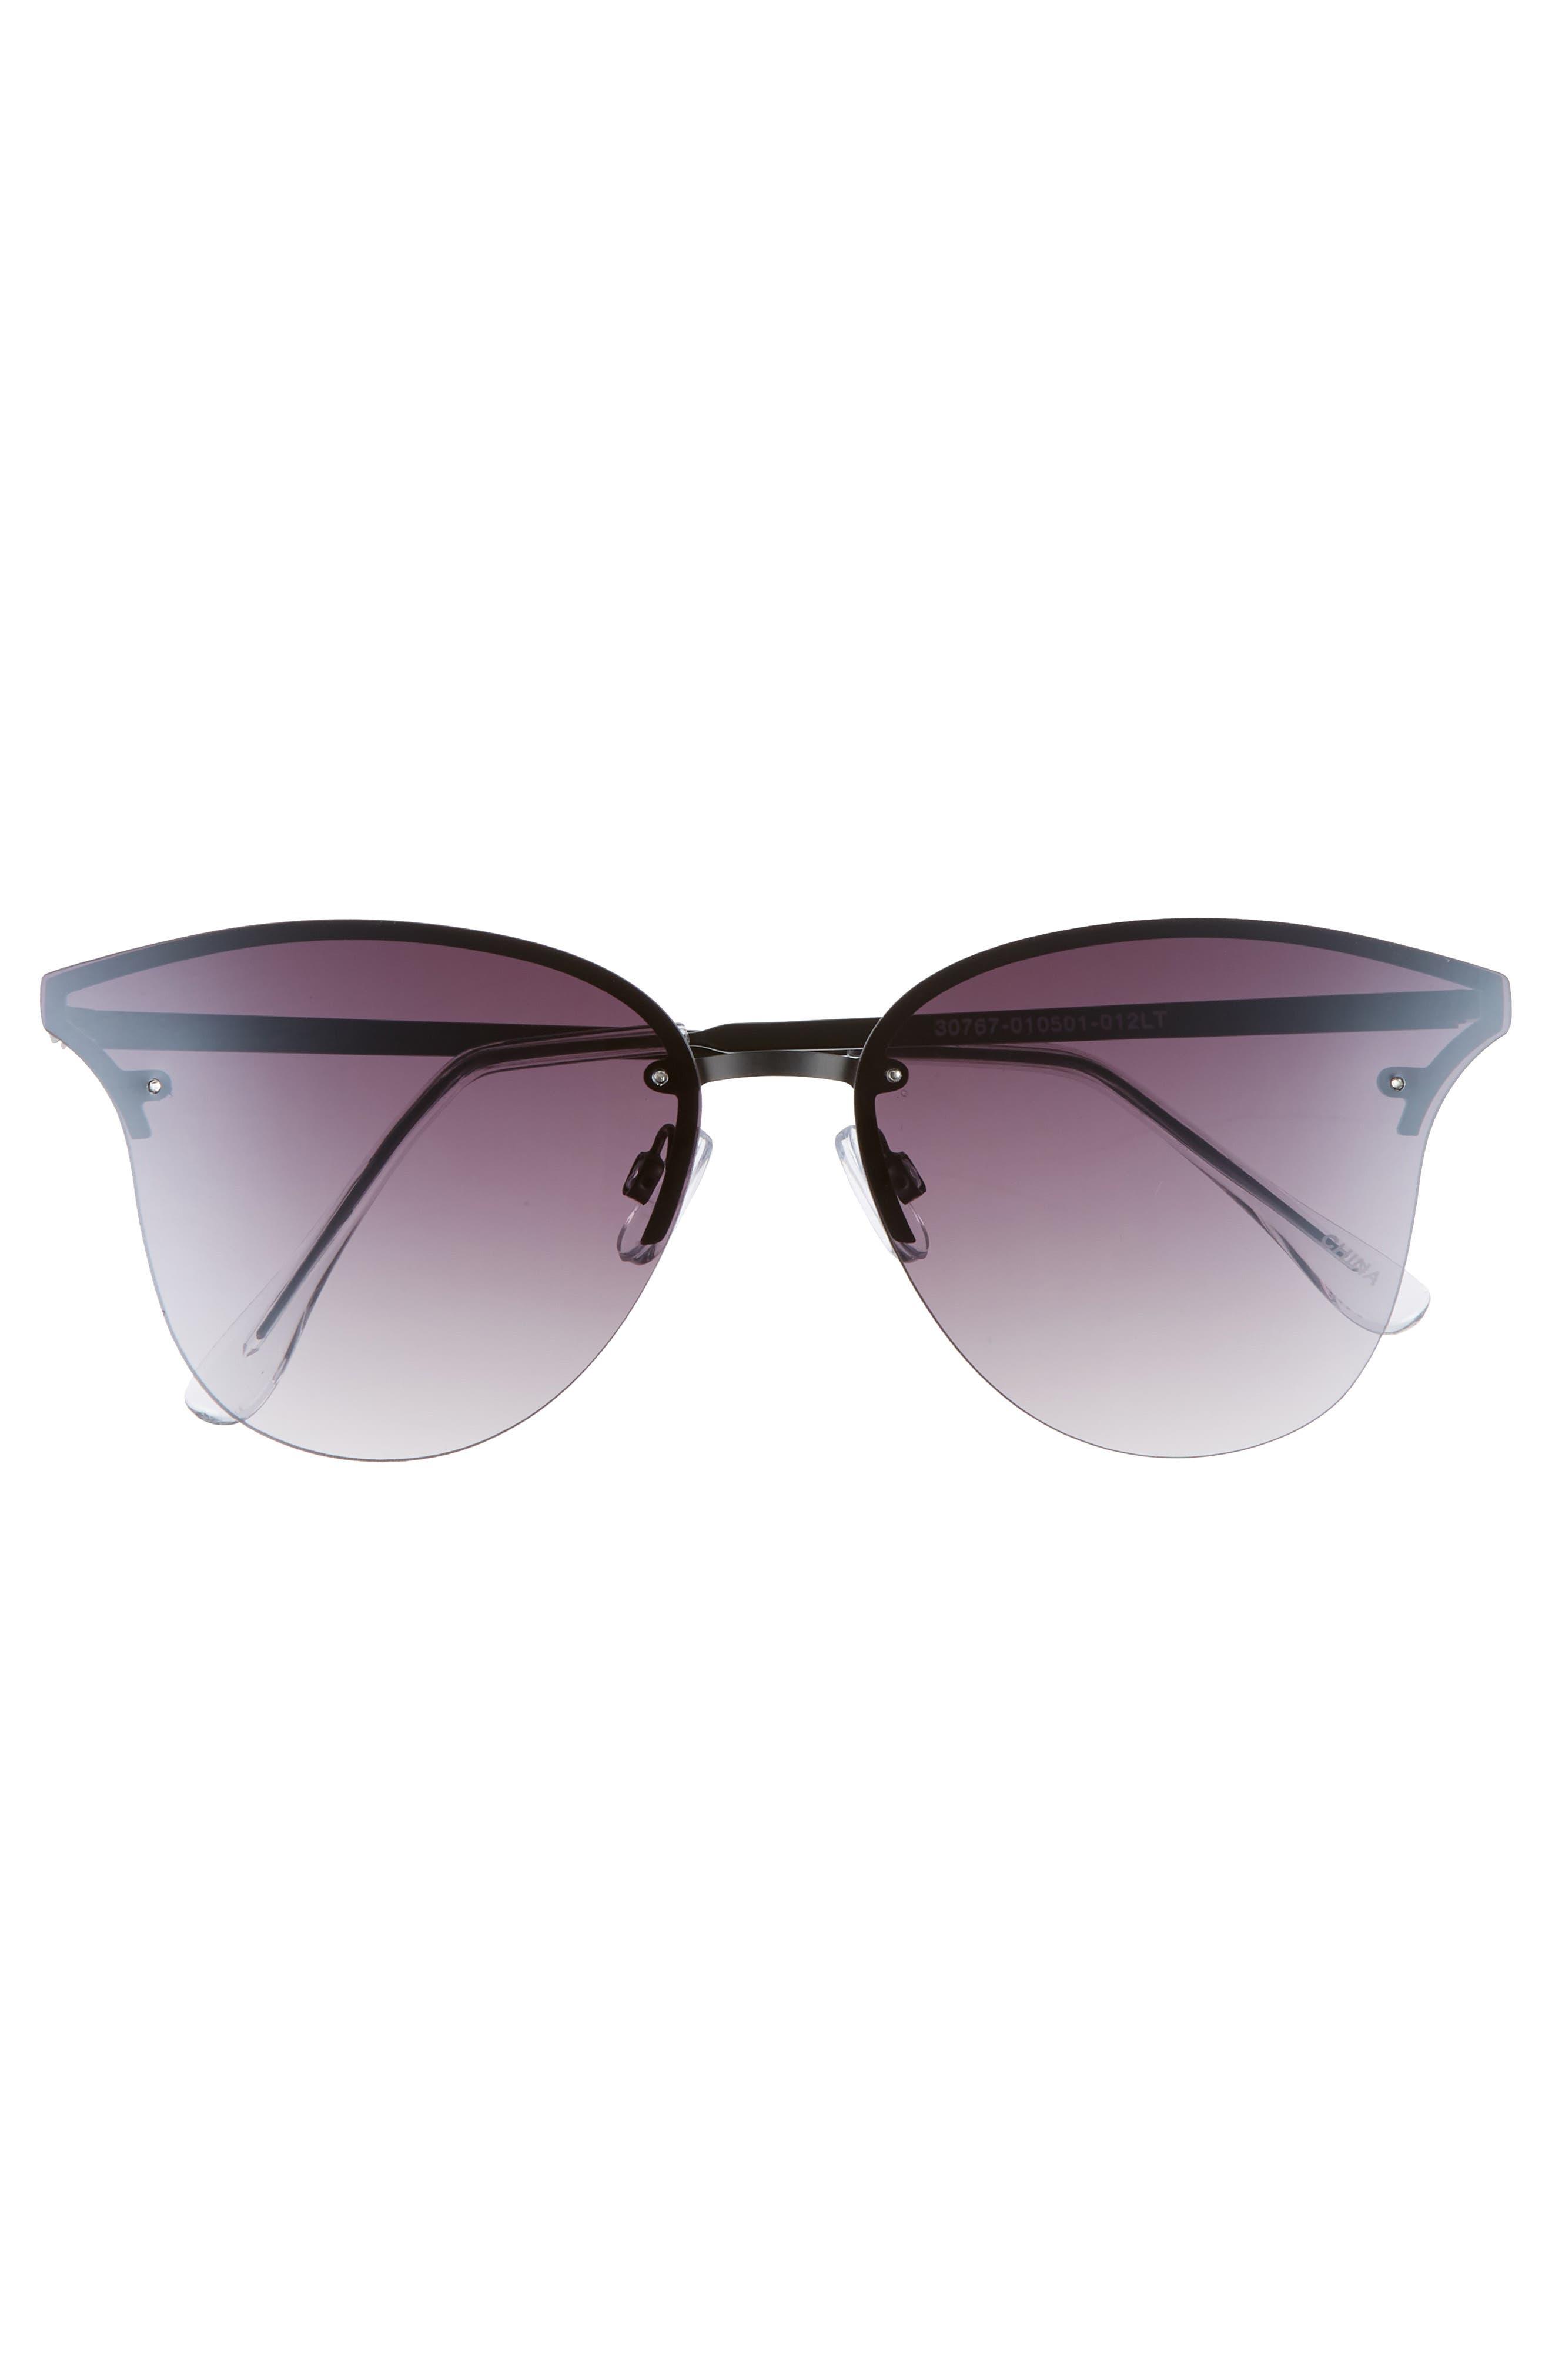 61mm Rimless Cat Eye Sunglasses,                             Alternate thumbnail 3, color,                             Black/ Black